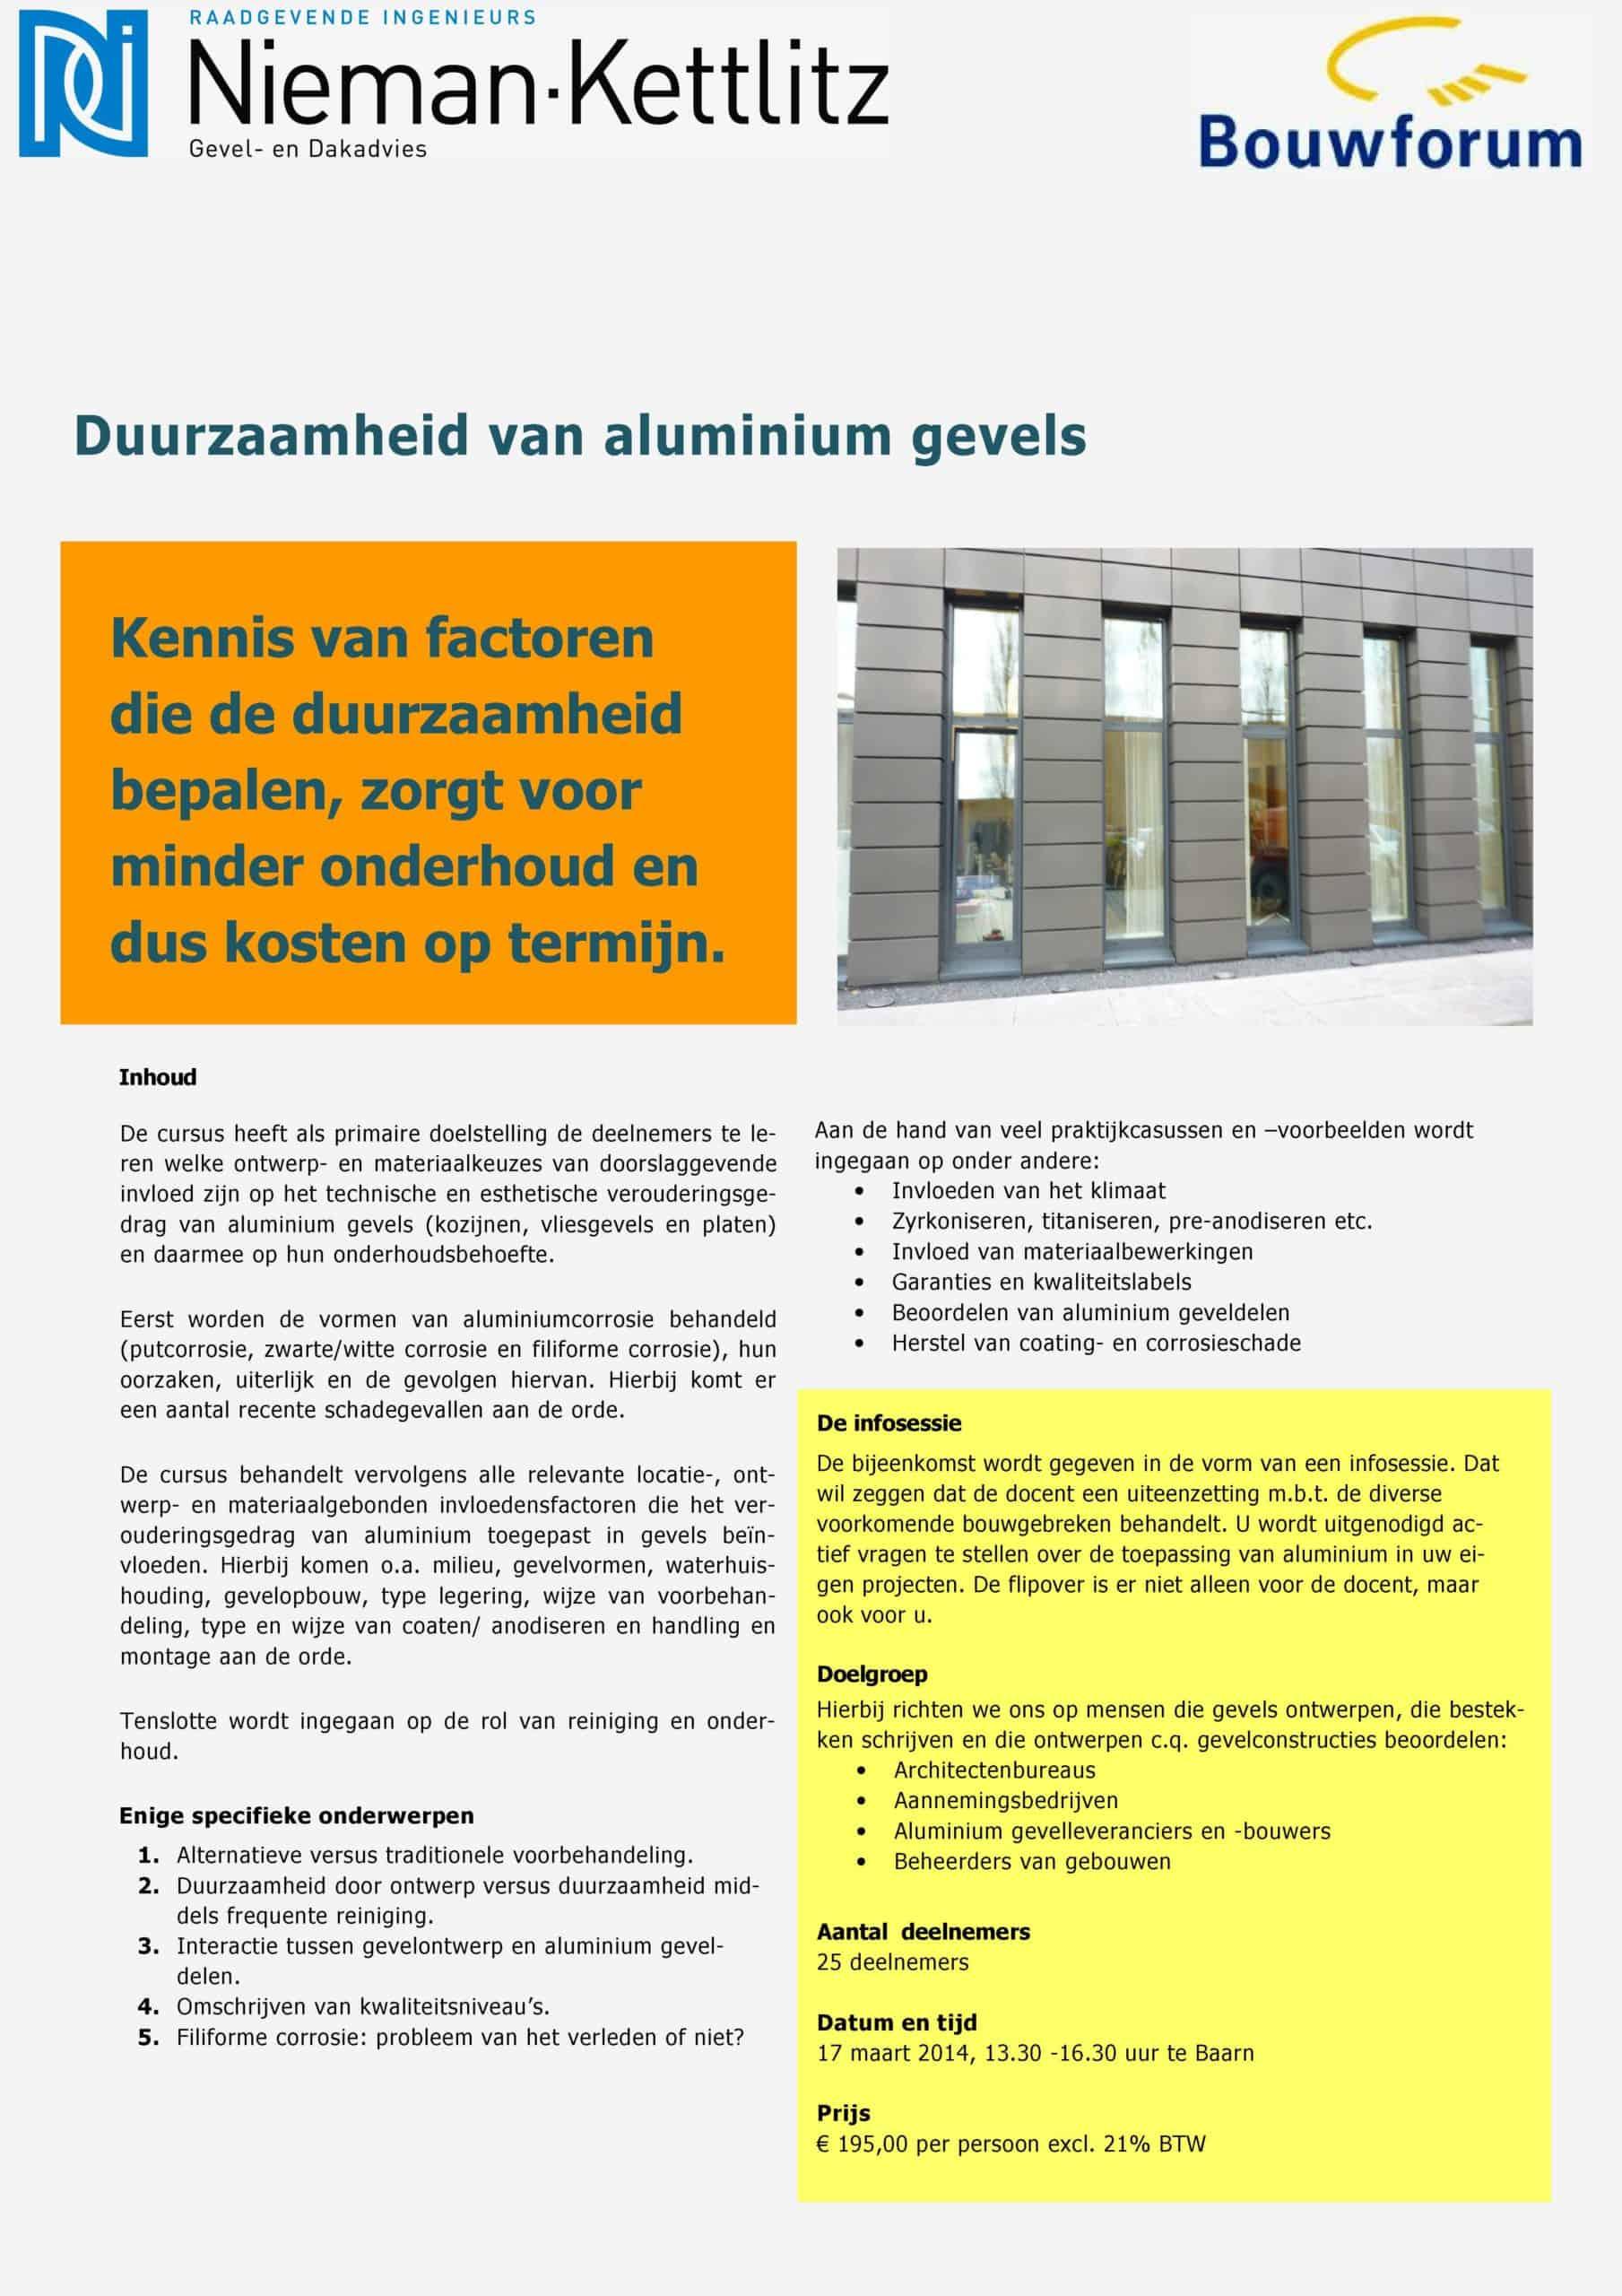 02-Info-Duurzaamheid-aluminium-gevels-1-scaled